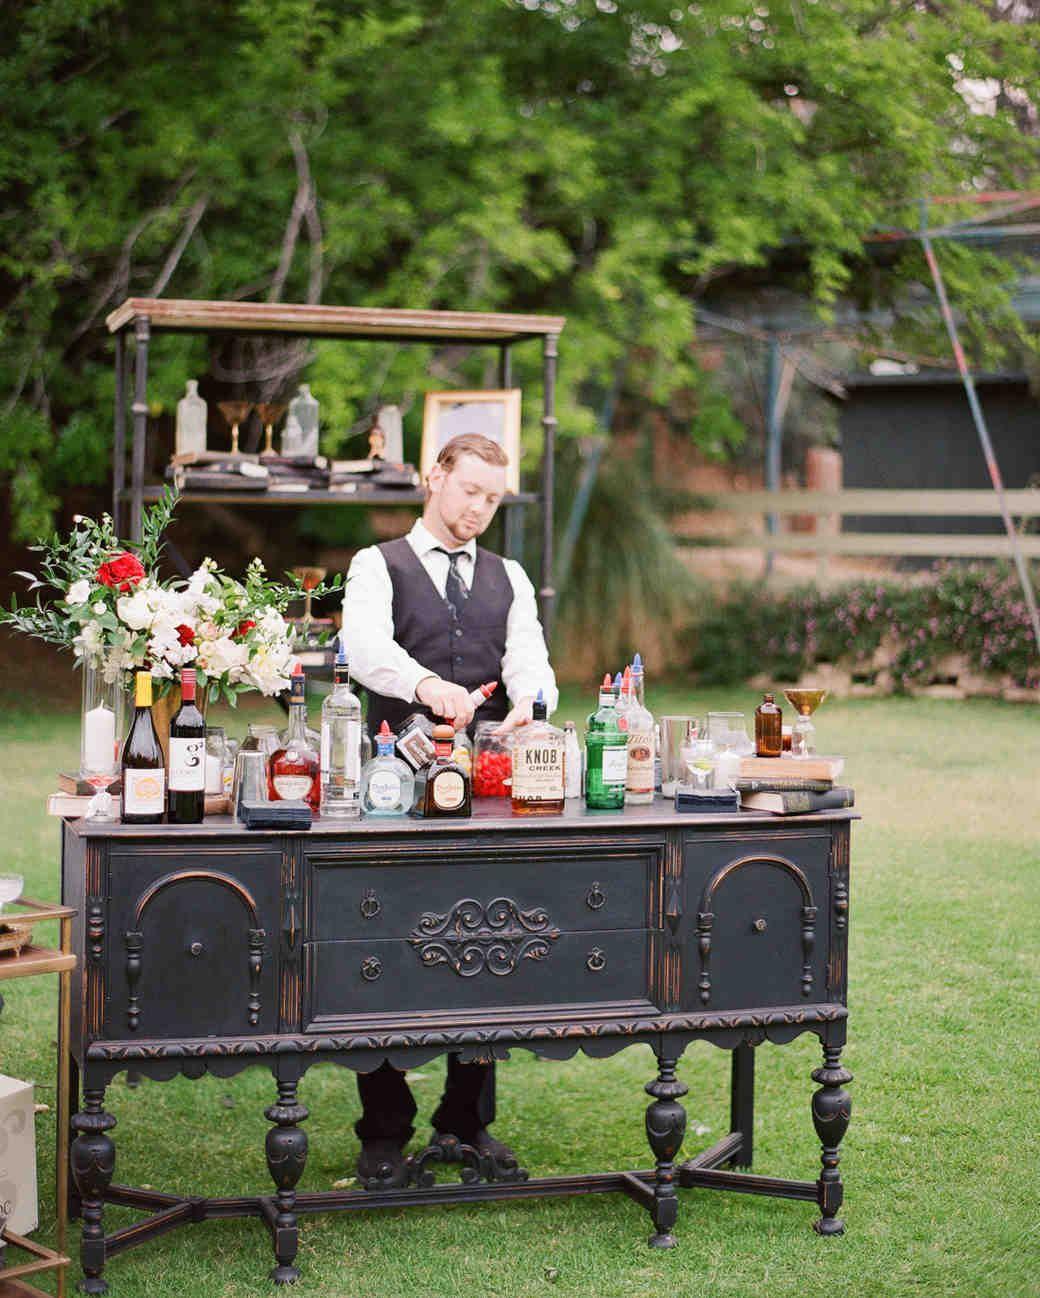 Outdoor Wedding Bar Ideas: A Whimsical Malibu Wedding Inspired By The Greatest Love